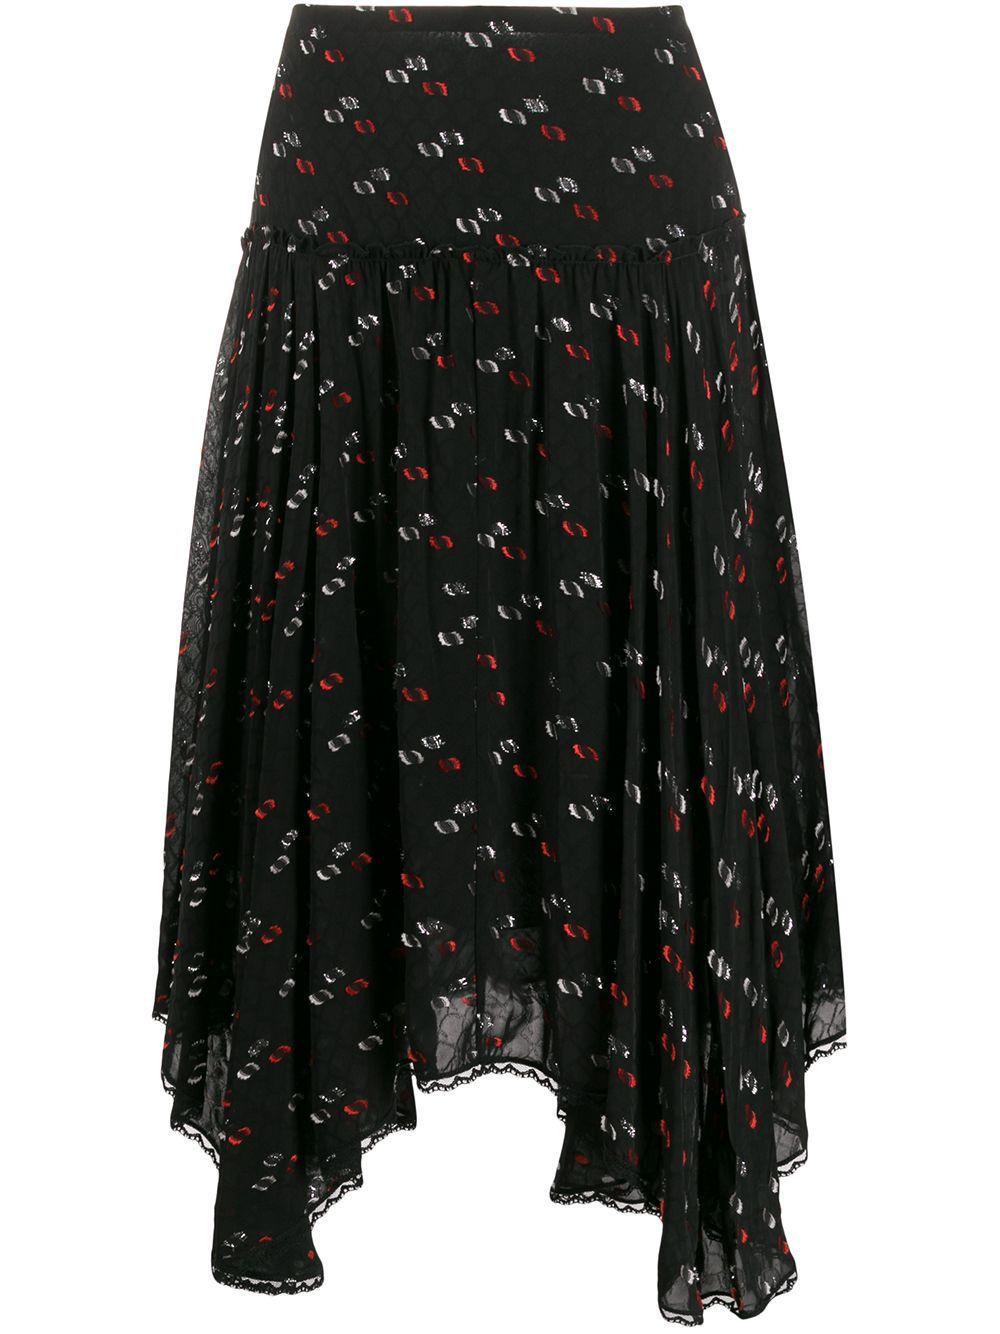 See By Chloé handkerchief-hem fil coupé skirt